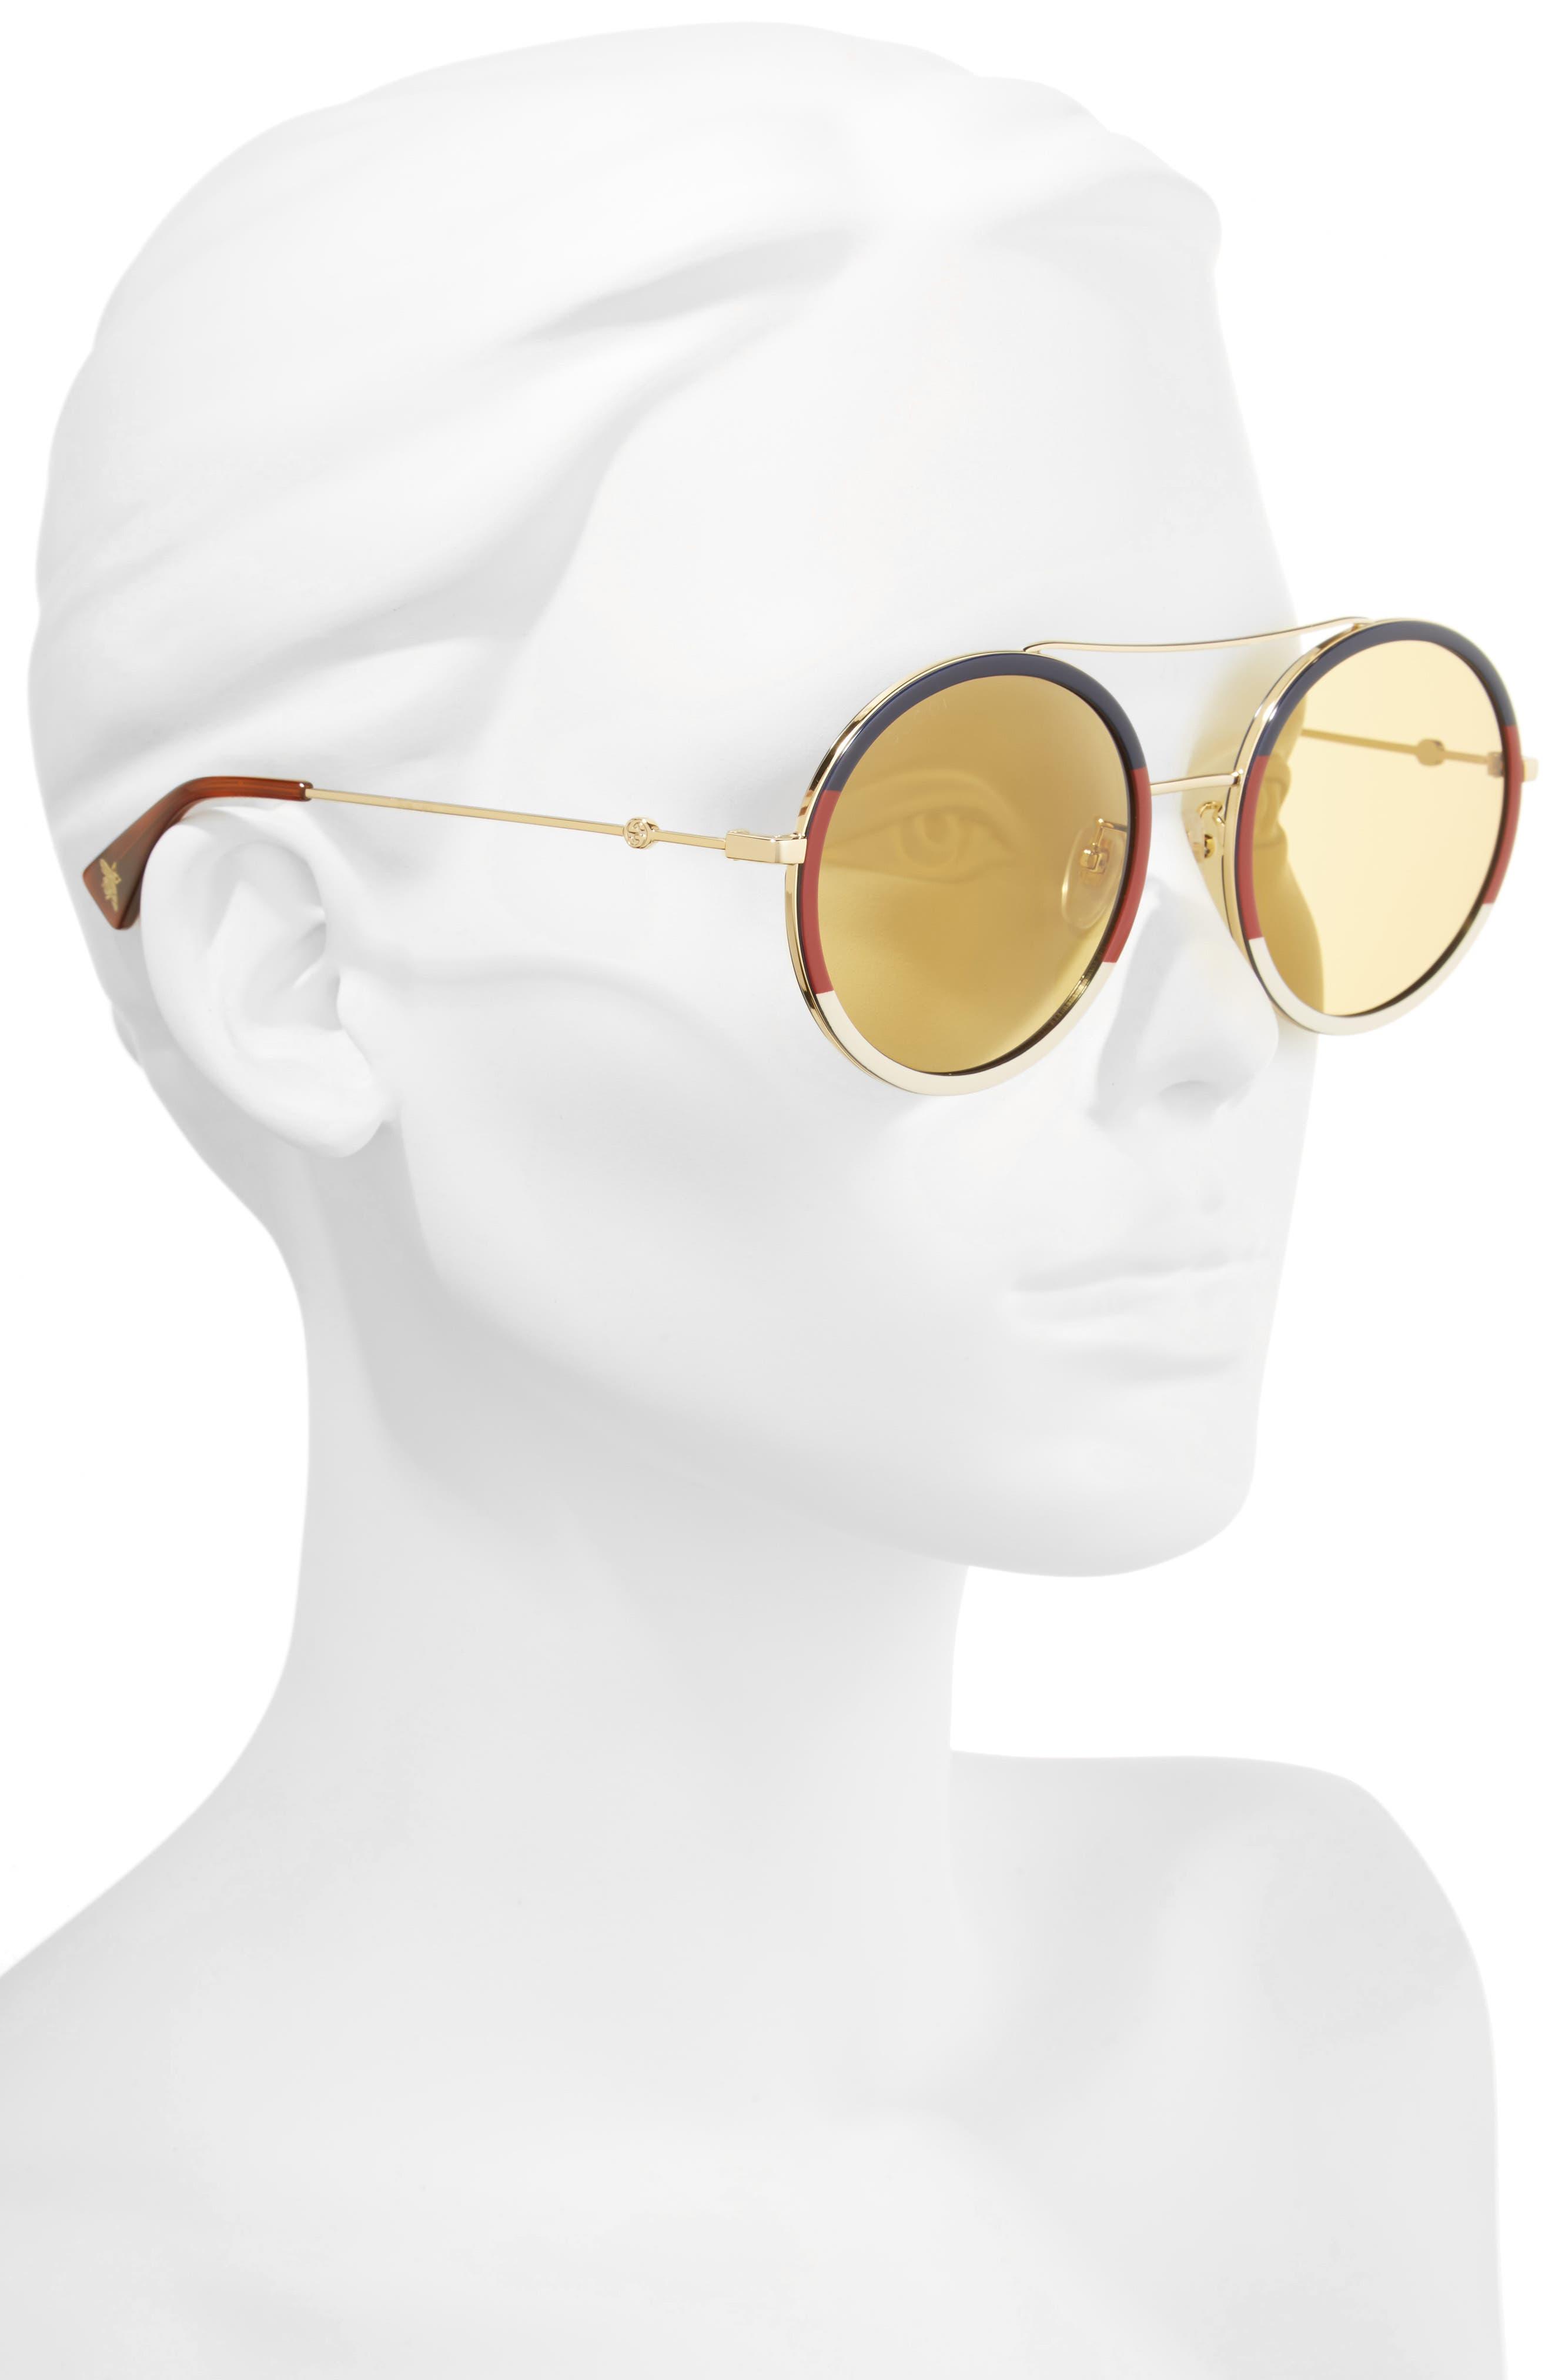 56mm Round Sunglasses,                             Alternate thumbnail 2, color,                             GOLD/ BLONDE HAVANA